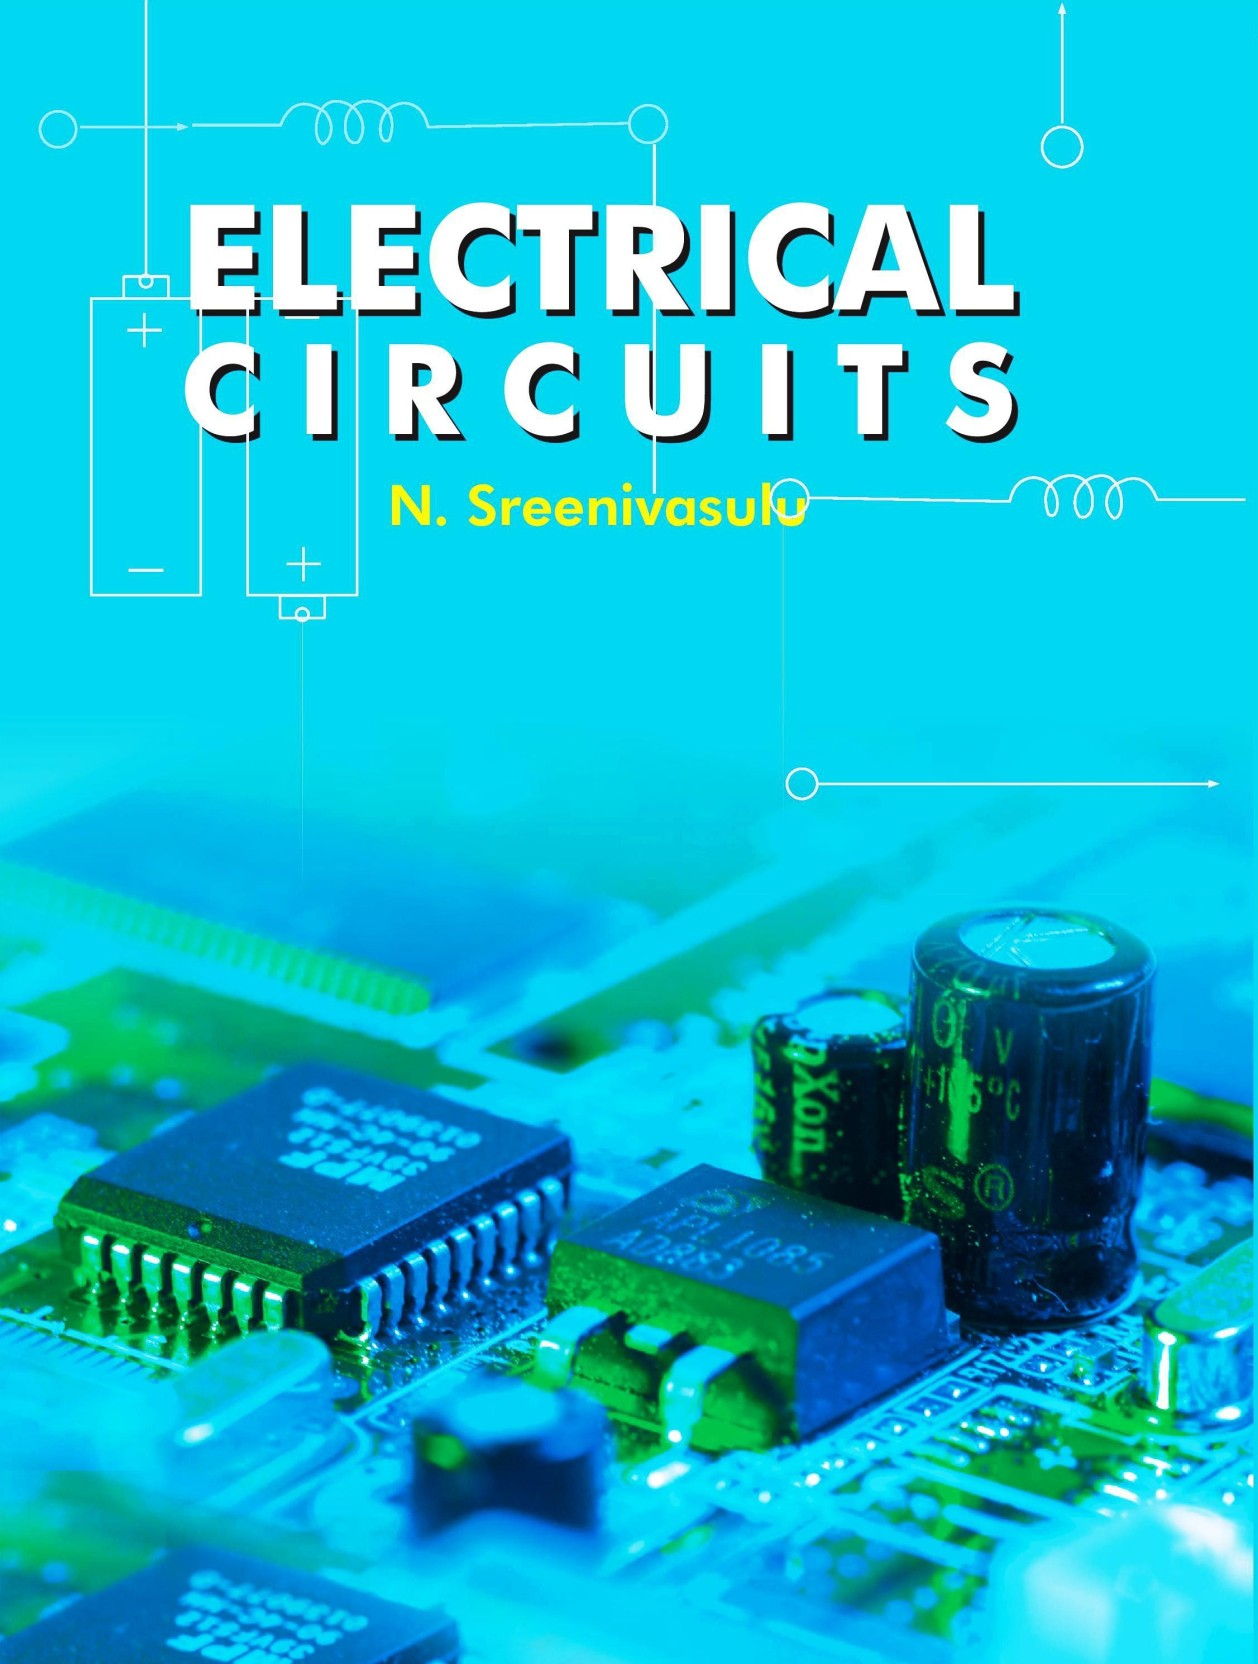 Electrical Circuits Buy By N Sreenivasulu At Electric Circuit Board Processor Tshirt Share